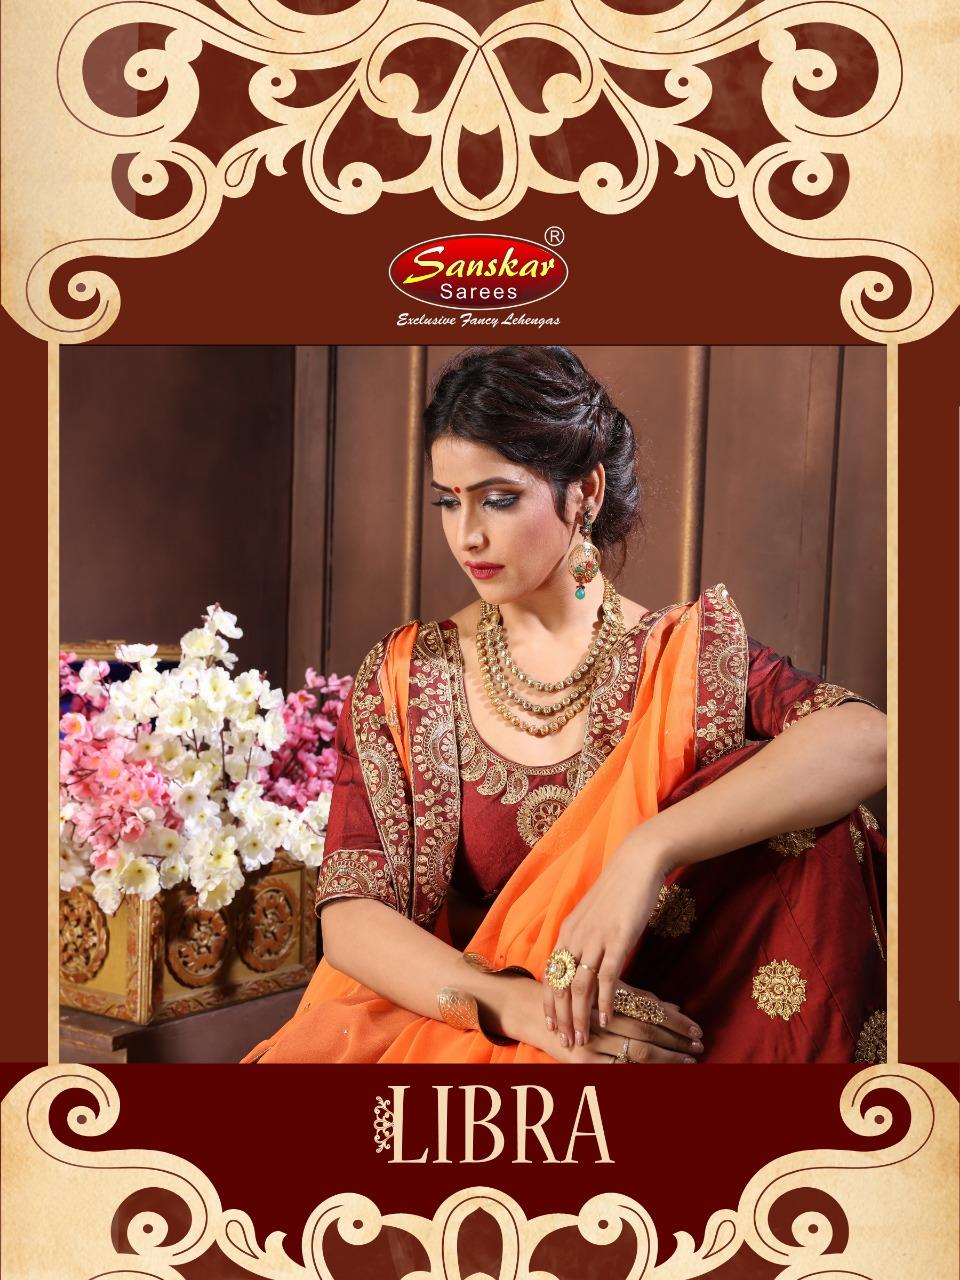 Sanskar presents libra festival season tradition wedding collection of lehenga